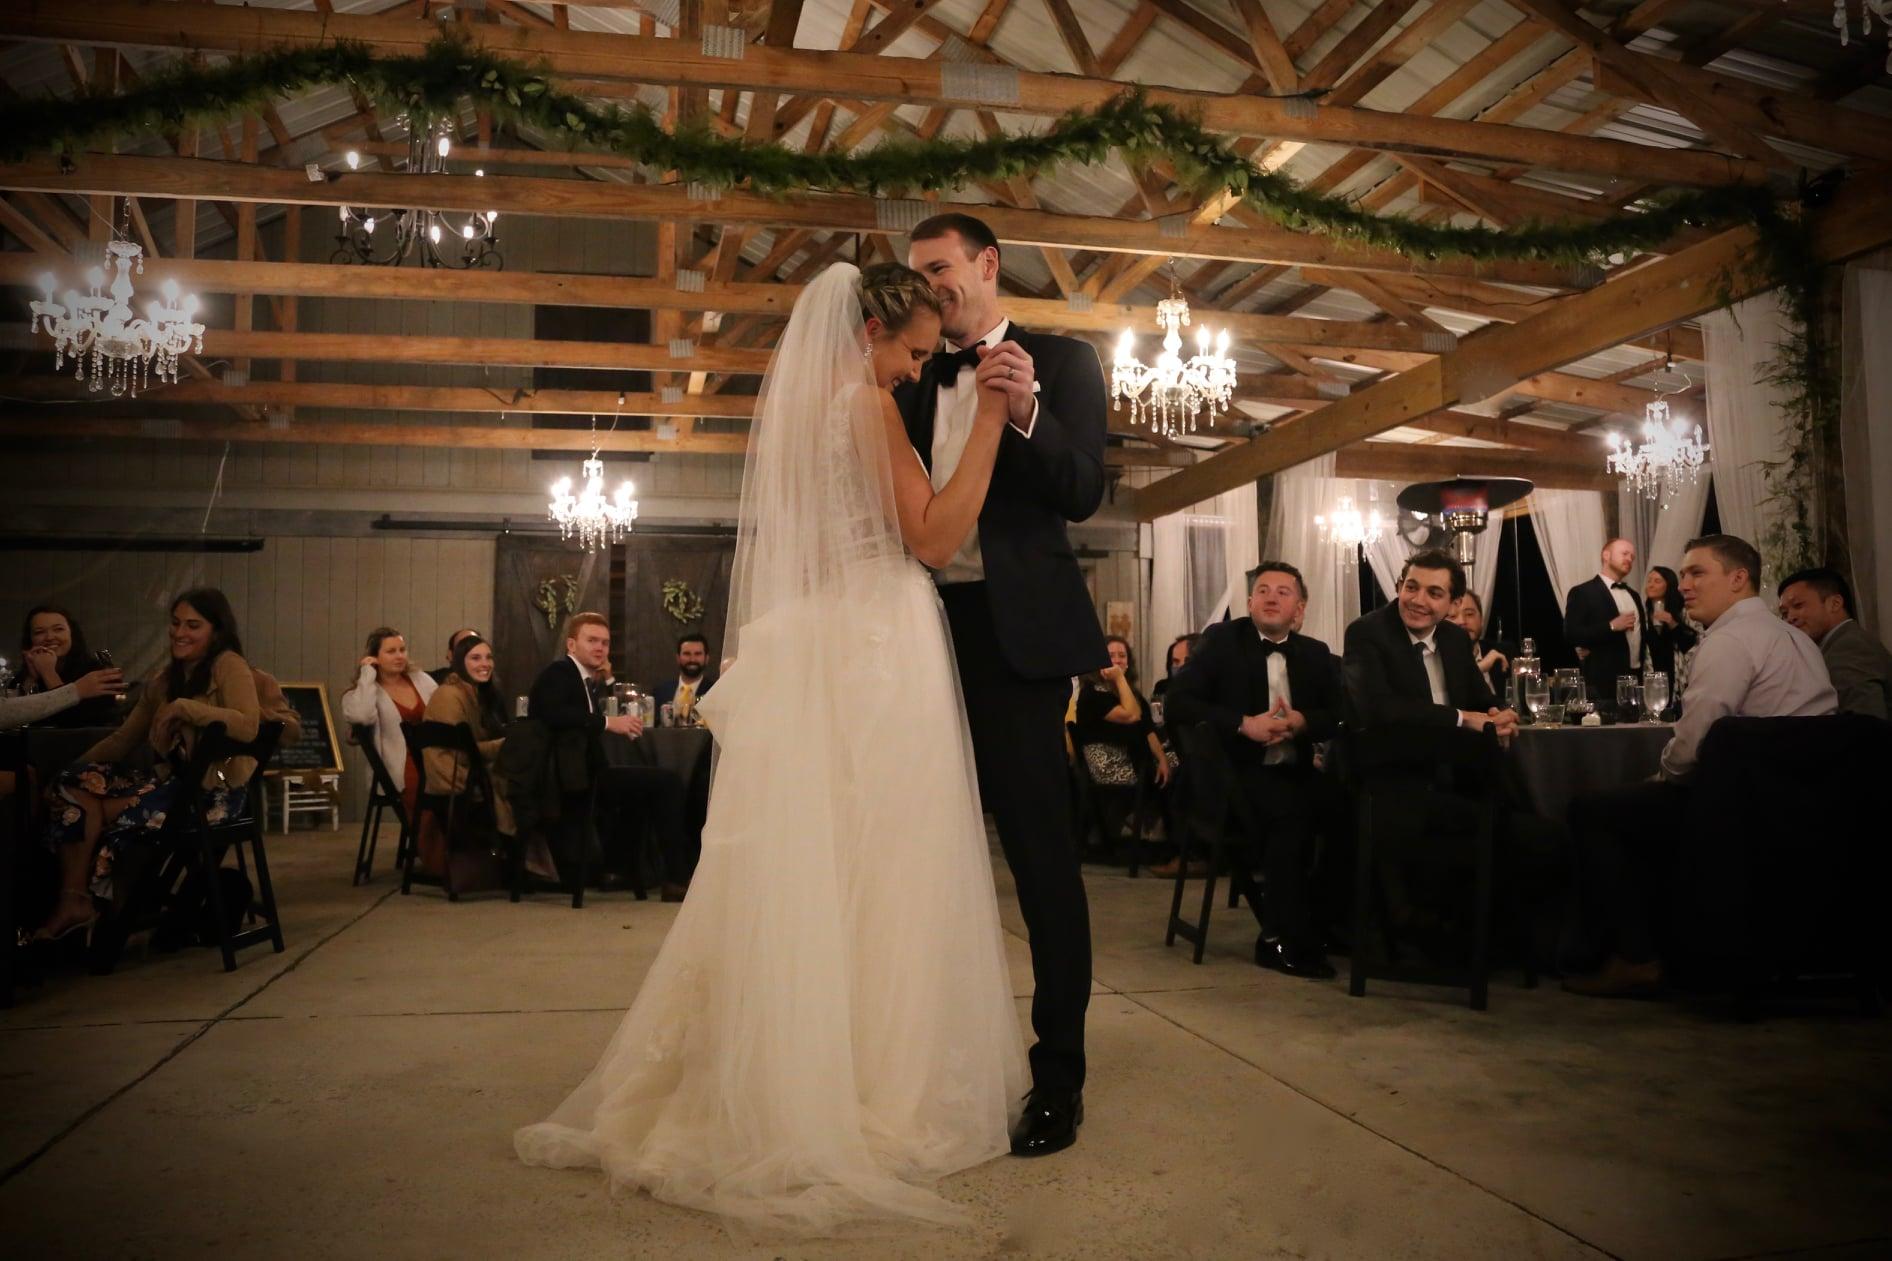 sugar pie honeybunch first dance song at pavilion barn wedding in raleigh north carolina at morris p